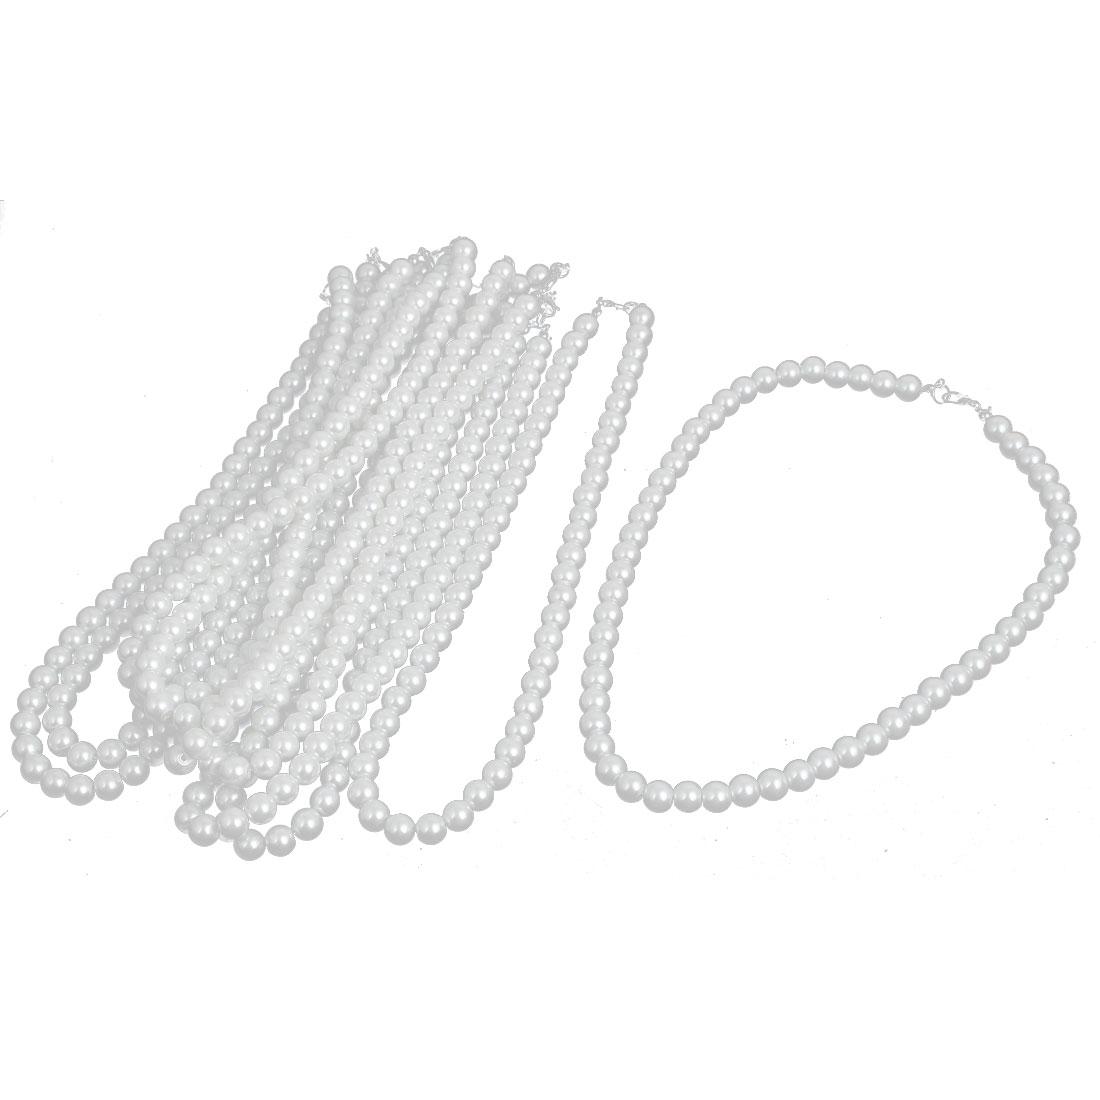 Wedding Faux Round Imitation Pearl Beaded Linked Necklace 42cm Length White 10pcs